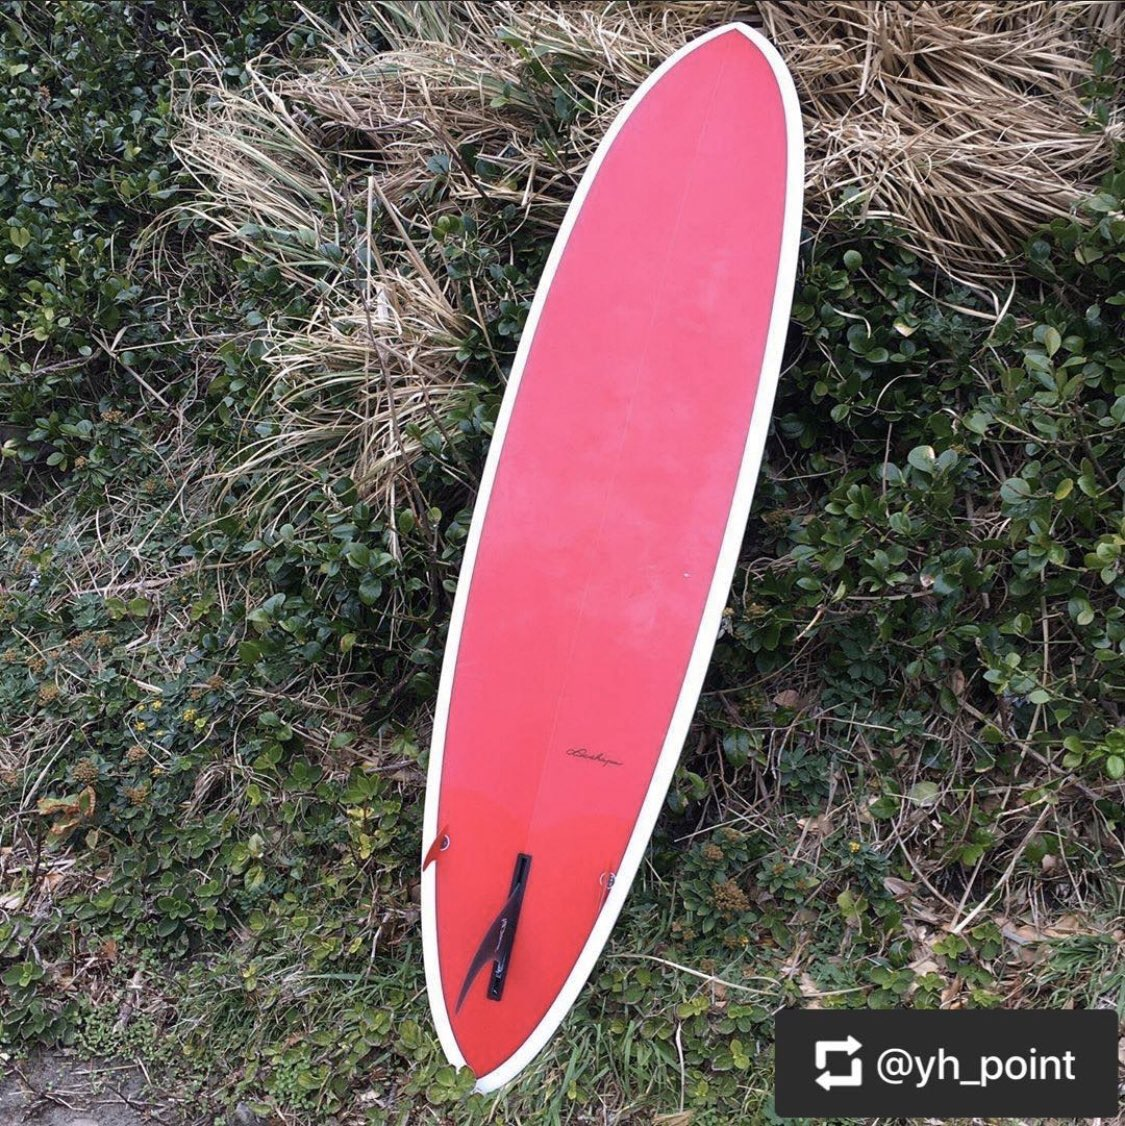 #repost  with @yh_point  @get_repost  good length!! .  #711 #seveneleven  #usblanks  #cutomorder  #surfboard  #standardstore  #surfmarket_jp  #chillmarket  #mellowsurfkorea  #acshape #wizardsurfboardsfactory #singlefin #ilovetwinfin #instasurf #chigasaki #shonan  #surf #surfingpic.twitter.com/TaSFOkUlzT